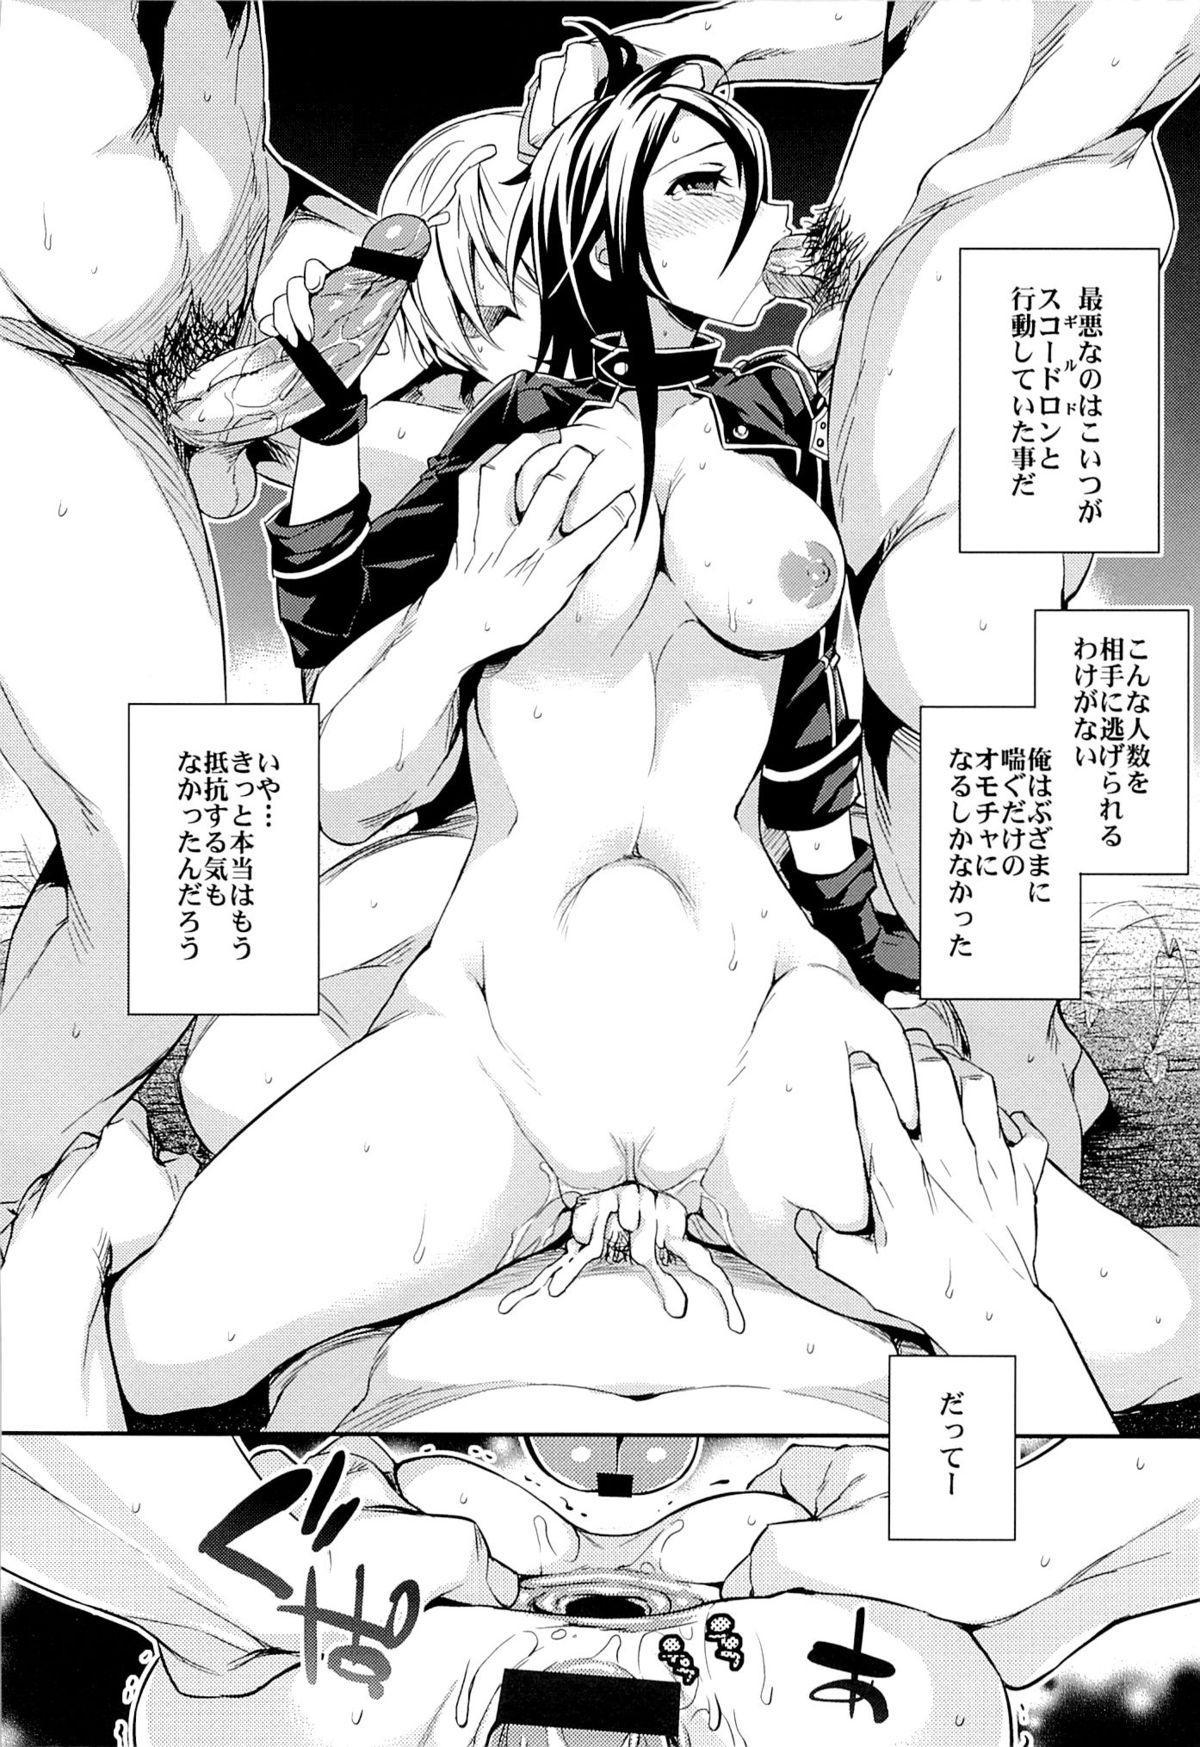 (SC65) [Crazy9 (Ichitaka)] C9-14 TS~Kirito-chan no Avatar wa Random Nyotai (Sword Art Online) 11